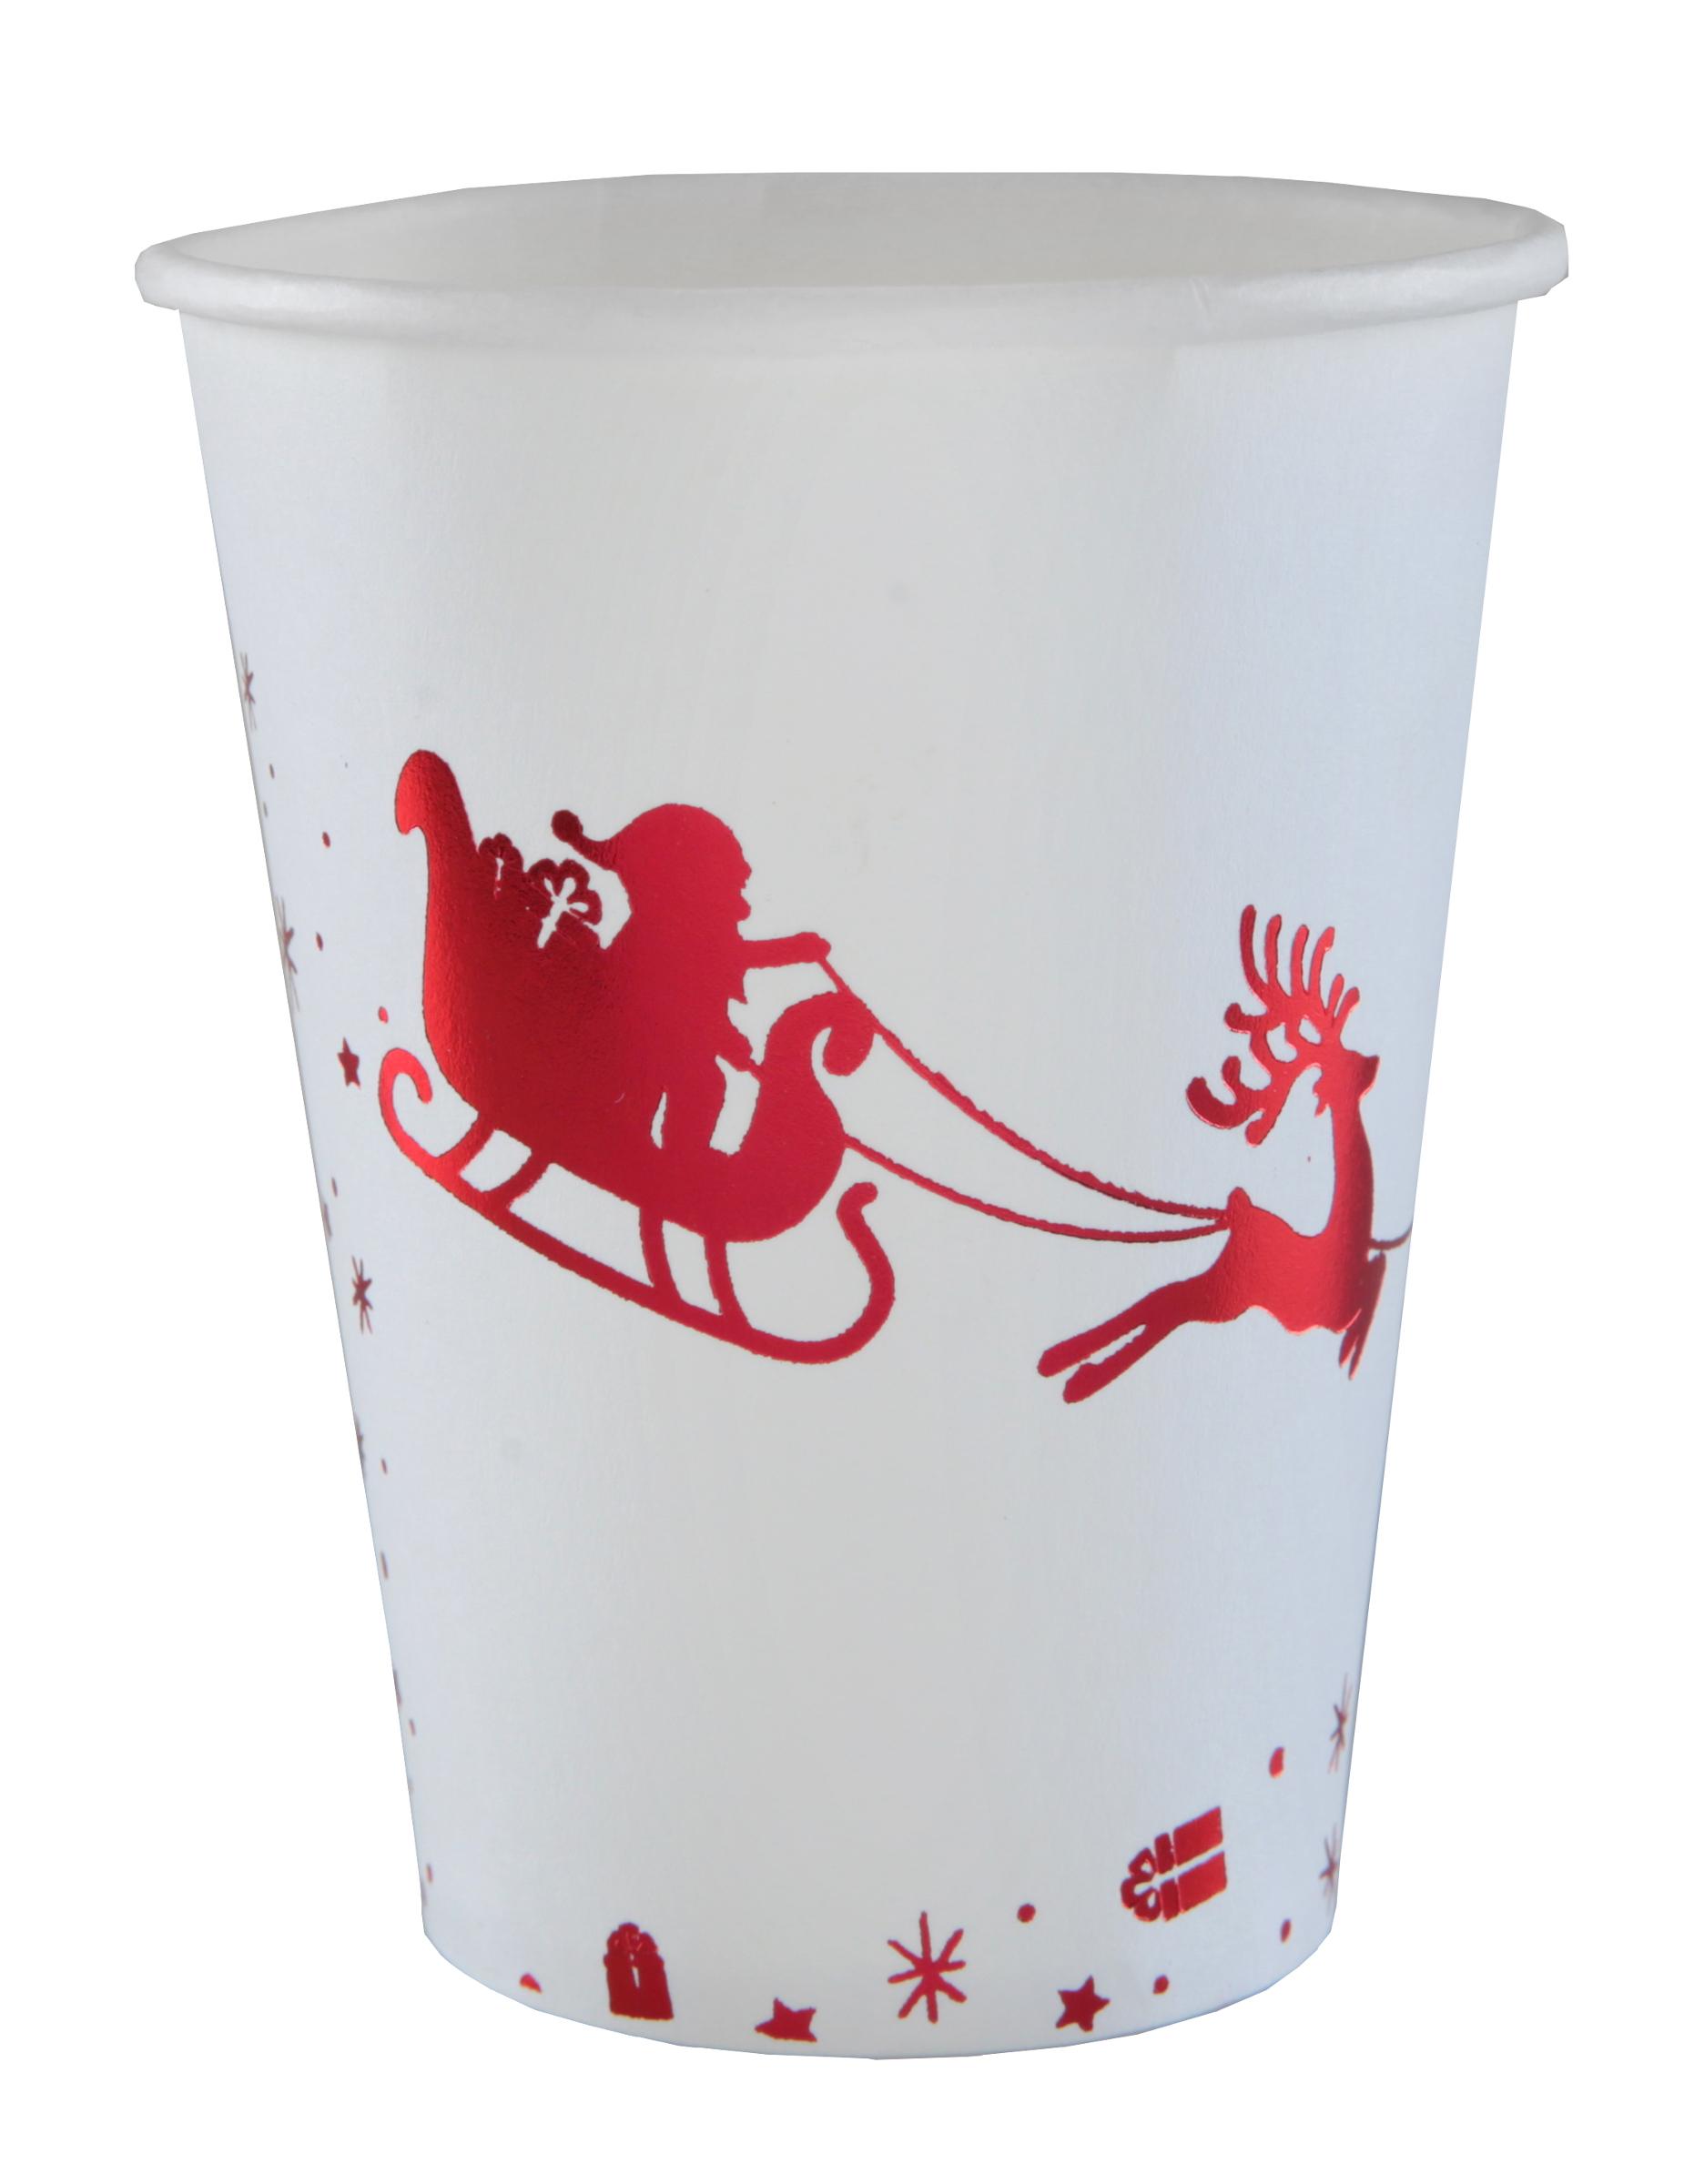 Slitta Di Babbo Natale Fai Da Te.10 Bicchieri In Cartone Slitta Di Babbo Natale Bianco E Rosso Su